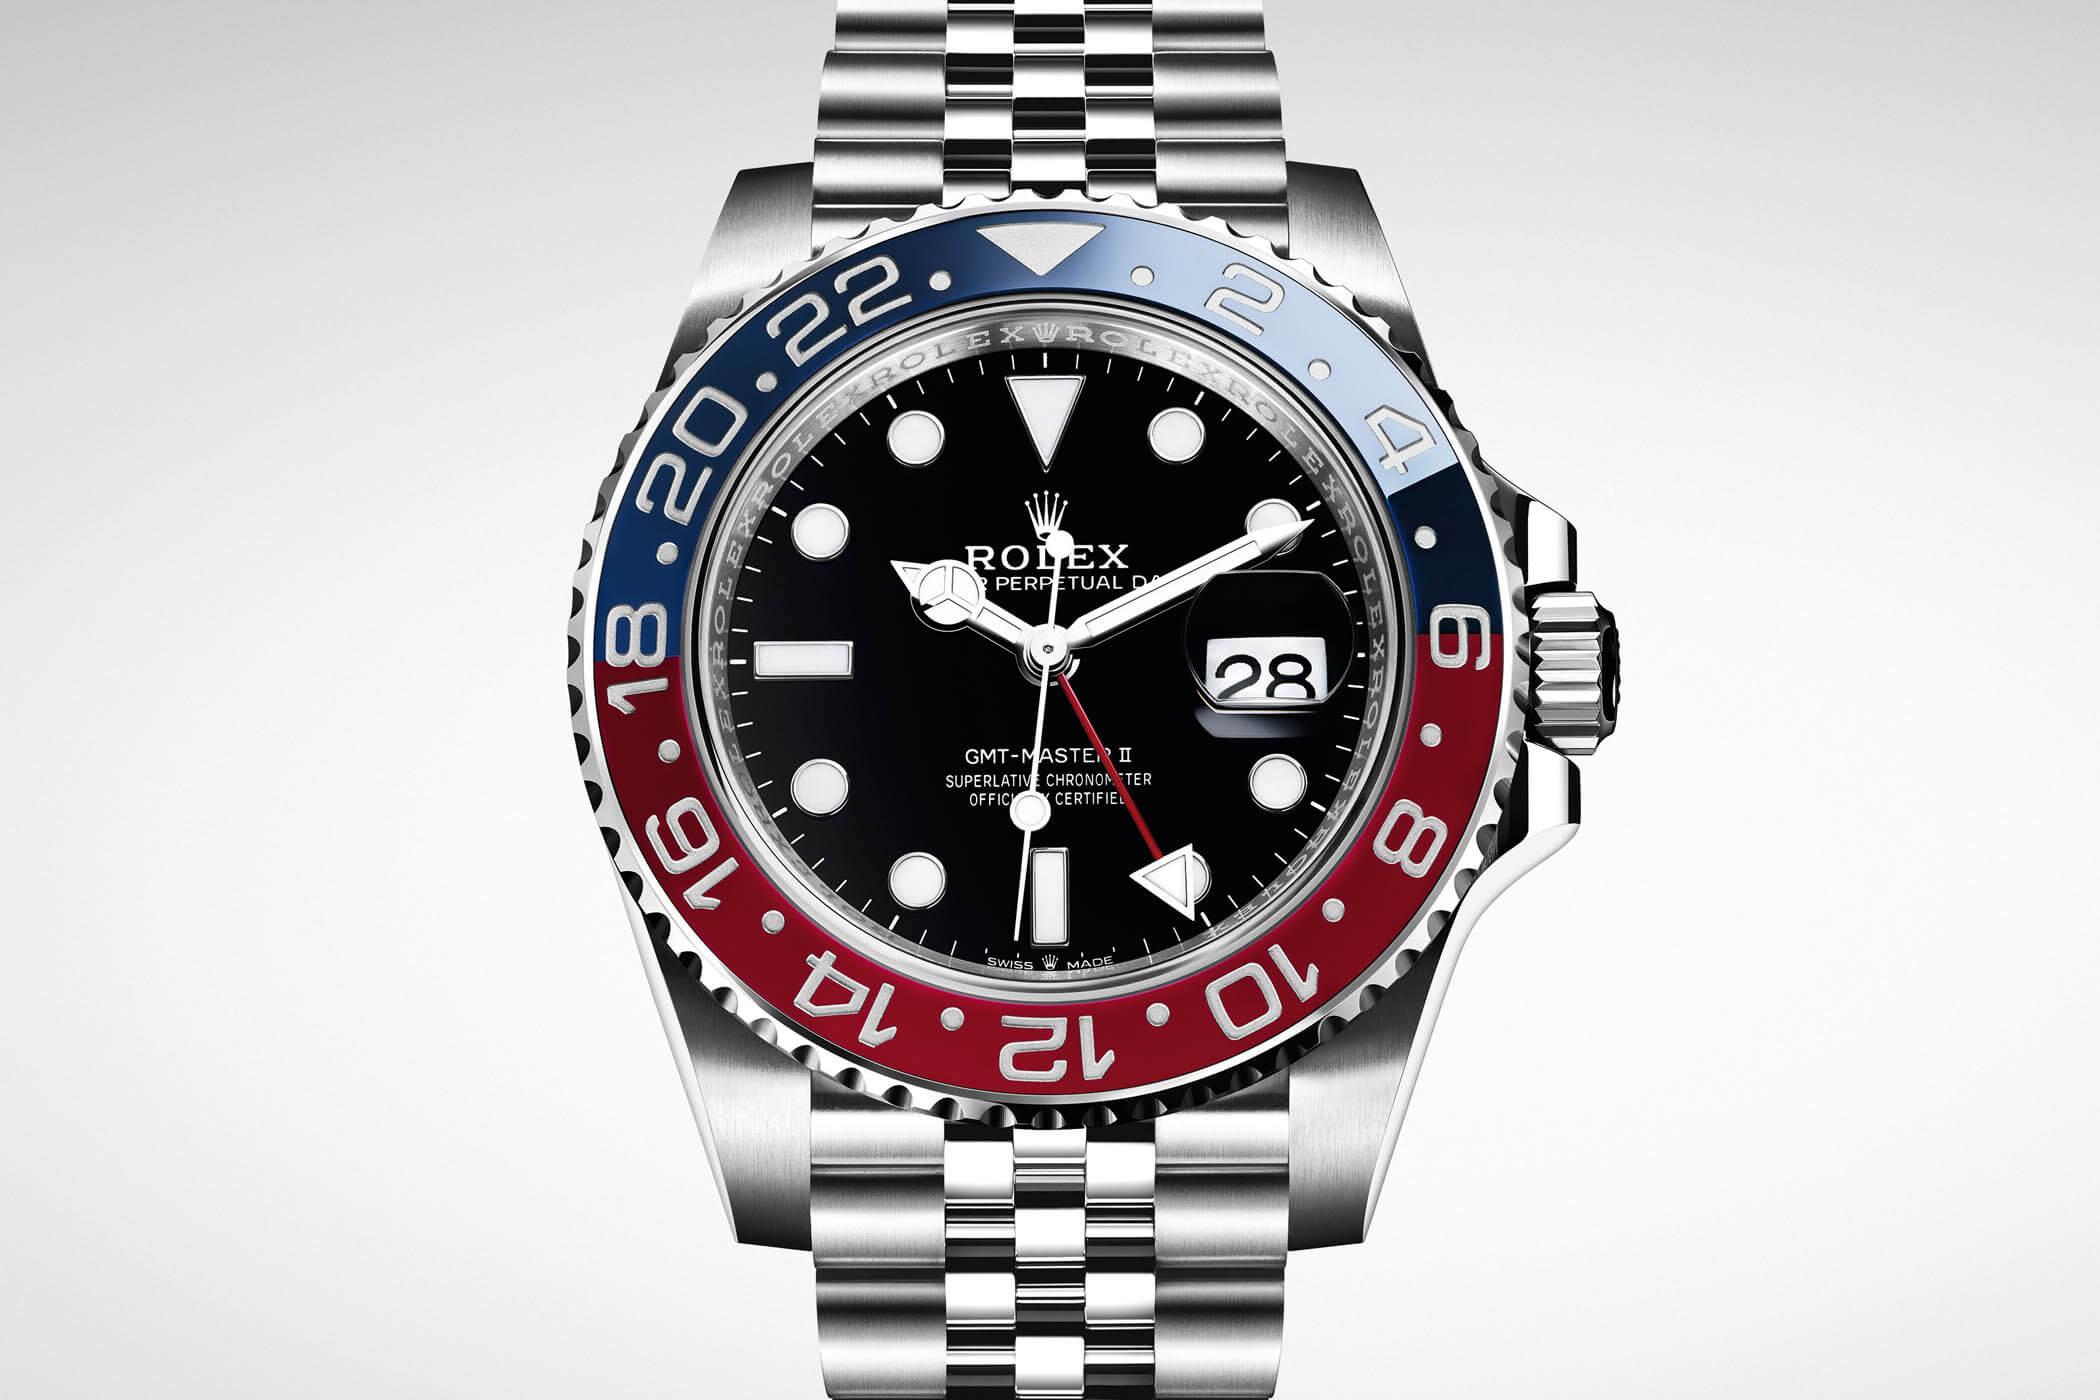 New Rolex GMT-Master II Pepsi ref. 126710 BLRO